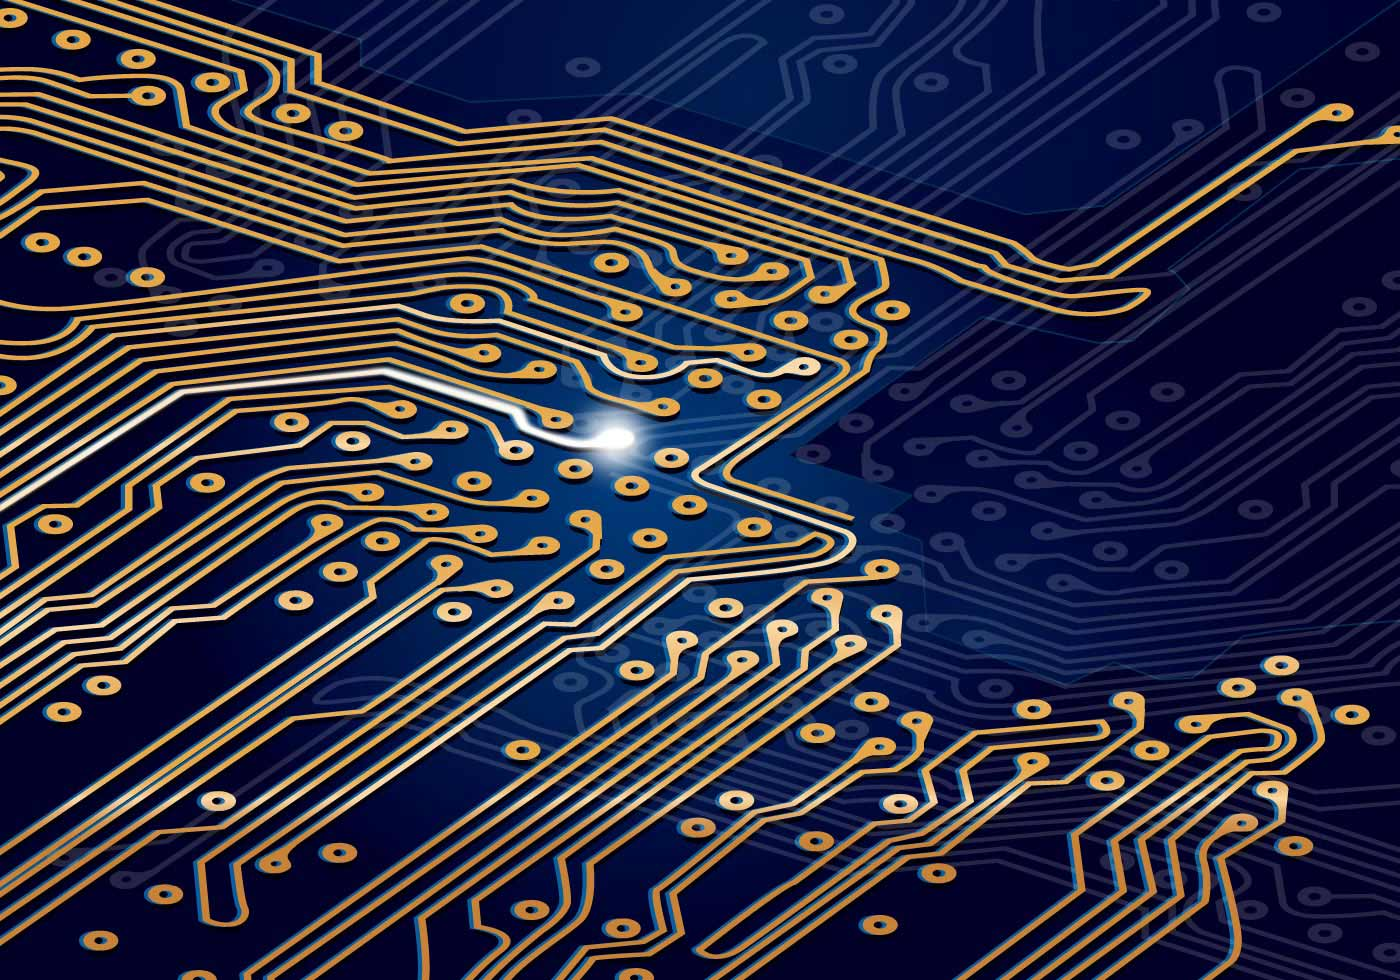 1400x980px Circuit Board Background - WallpaperSafari